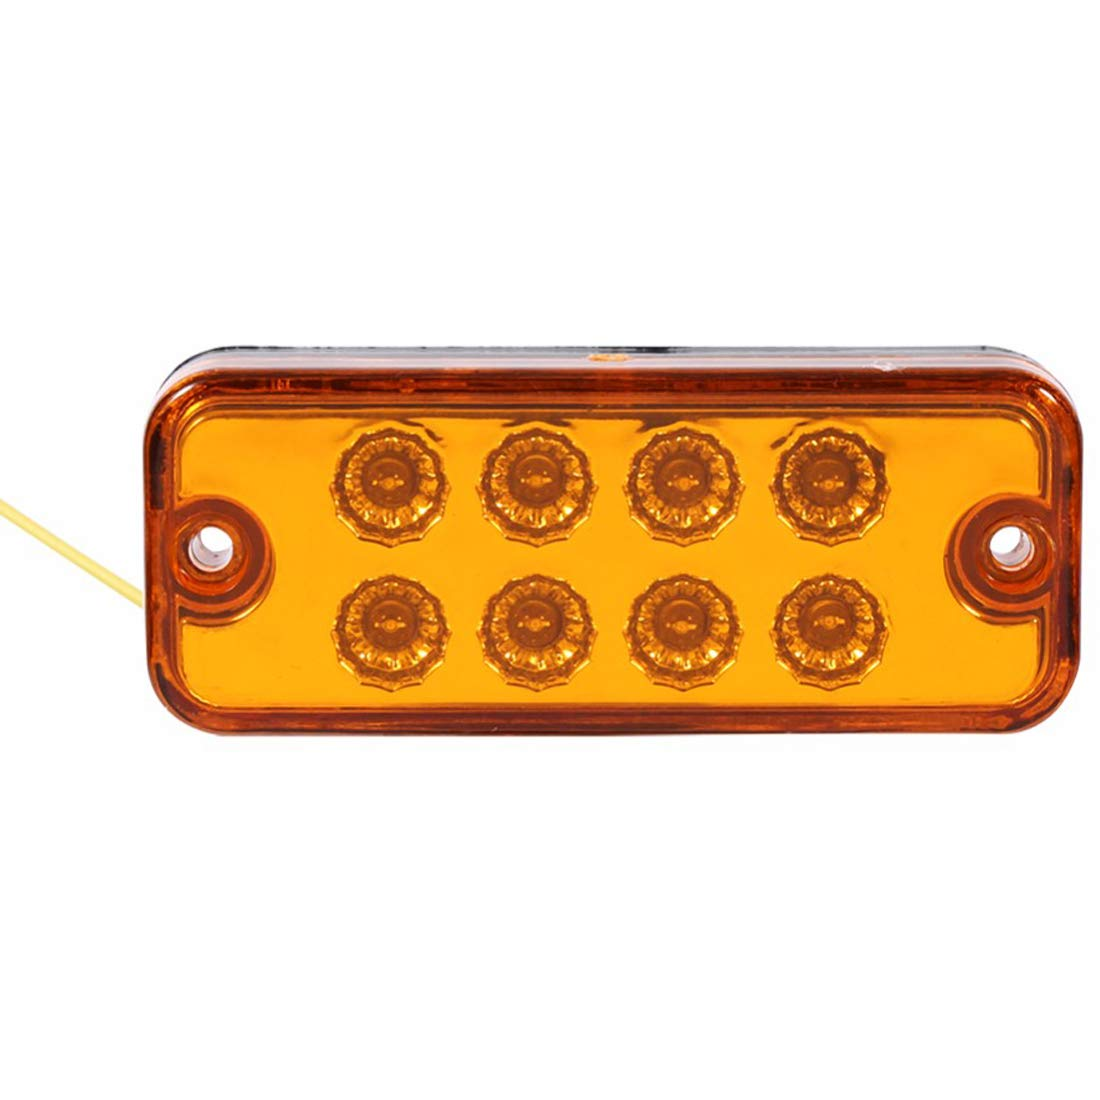 Luz Delantera de la L/ámpara Posterior Indicador para 24V Cami/ón Remolque Caravana RV Bus Luz de G/álibo VIGORFLYRUN PARTS LTD 6pcs 8 LED Luz de Marcador Lateral Amarillo